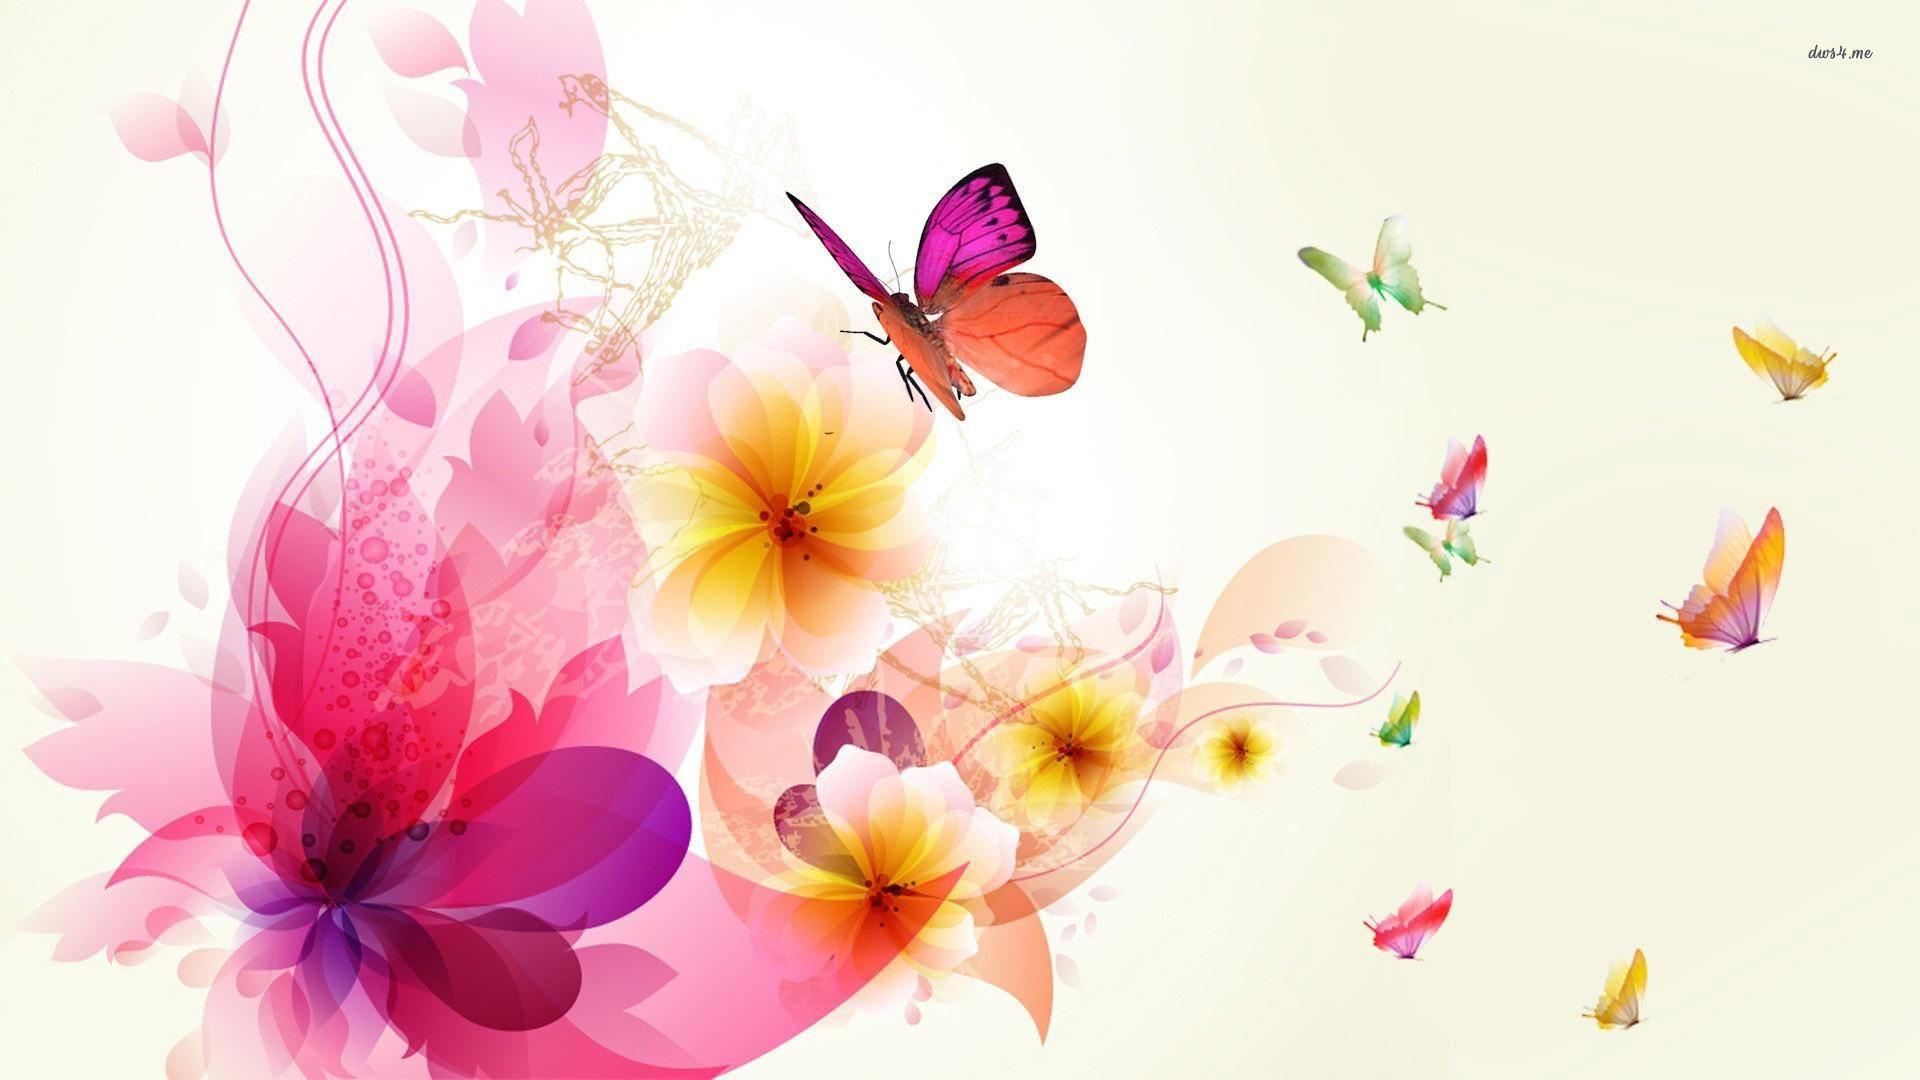 pinjasmin puddig on graphics | pinterest | 3d wallpaper